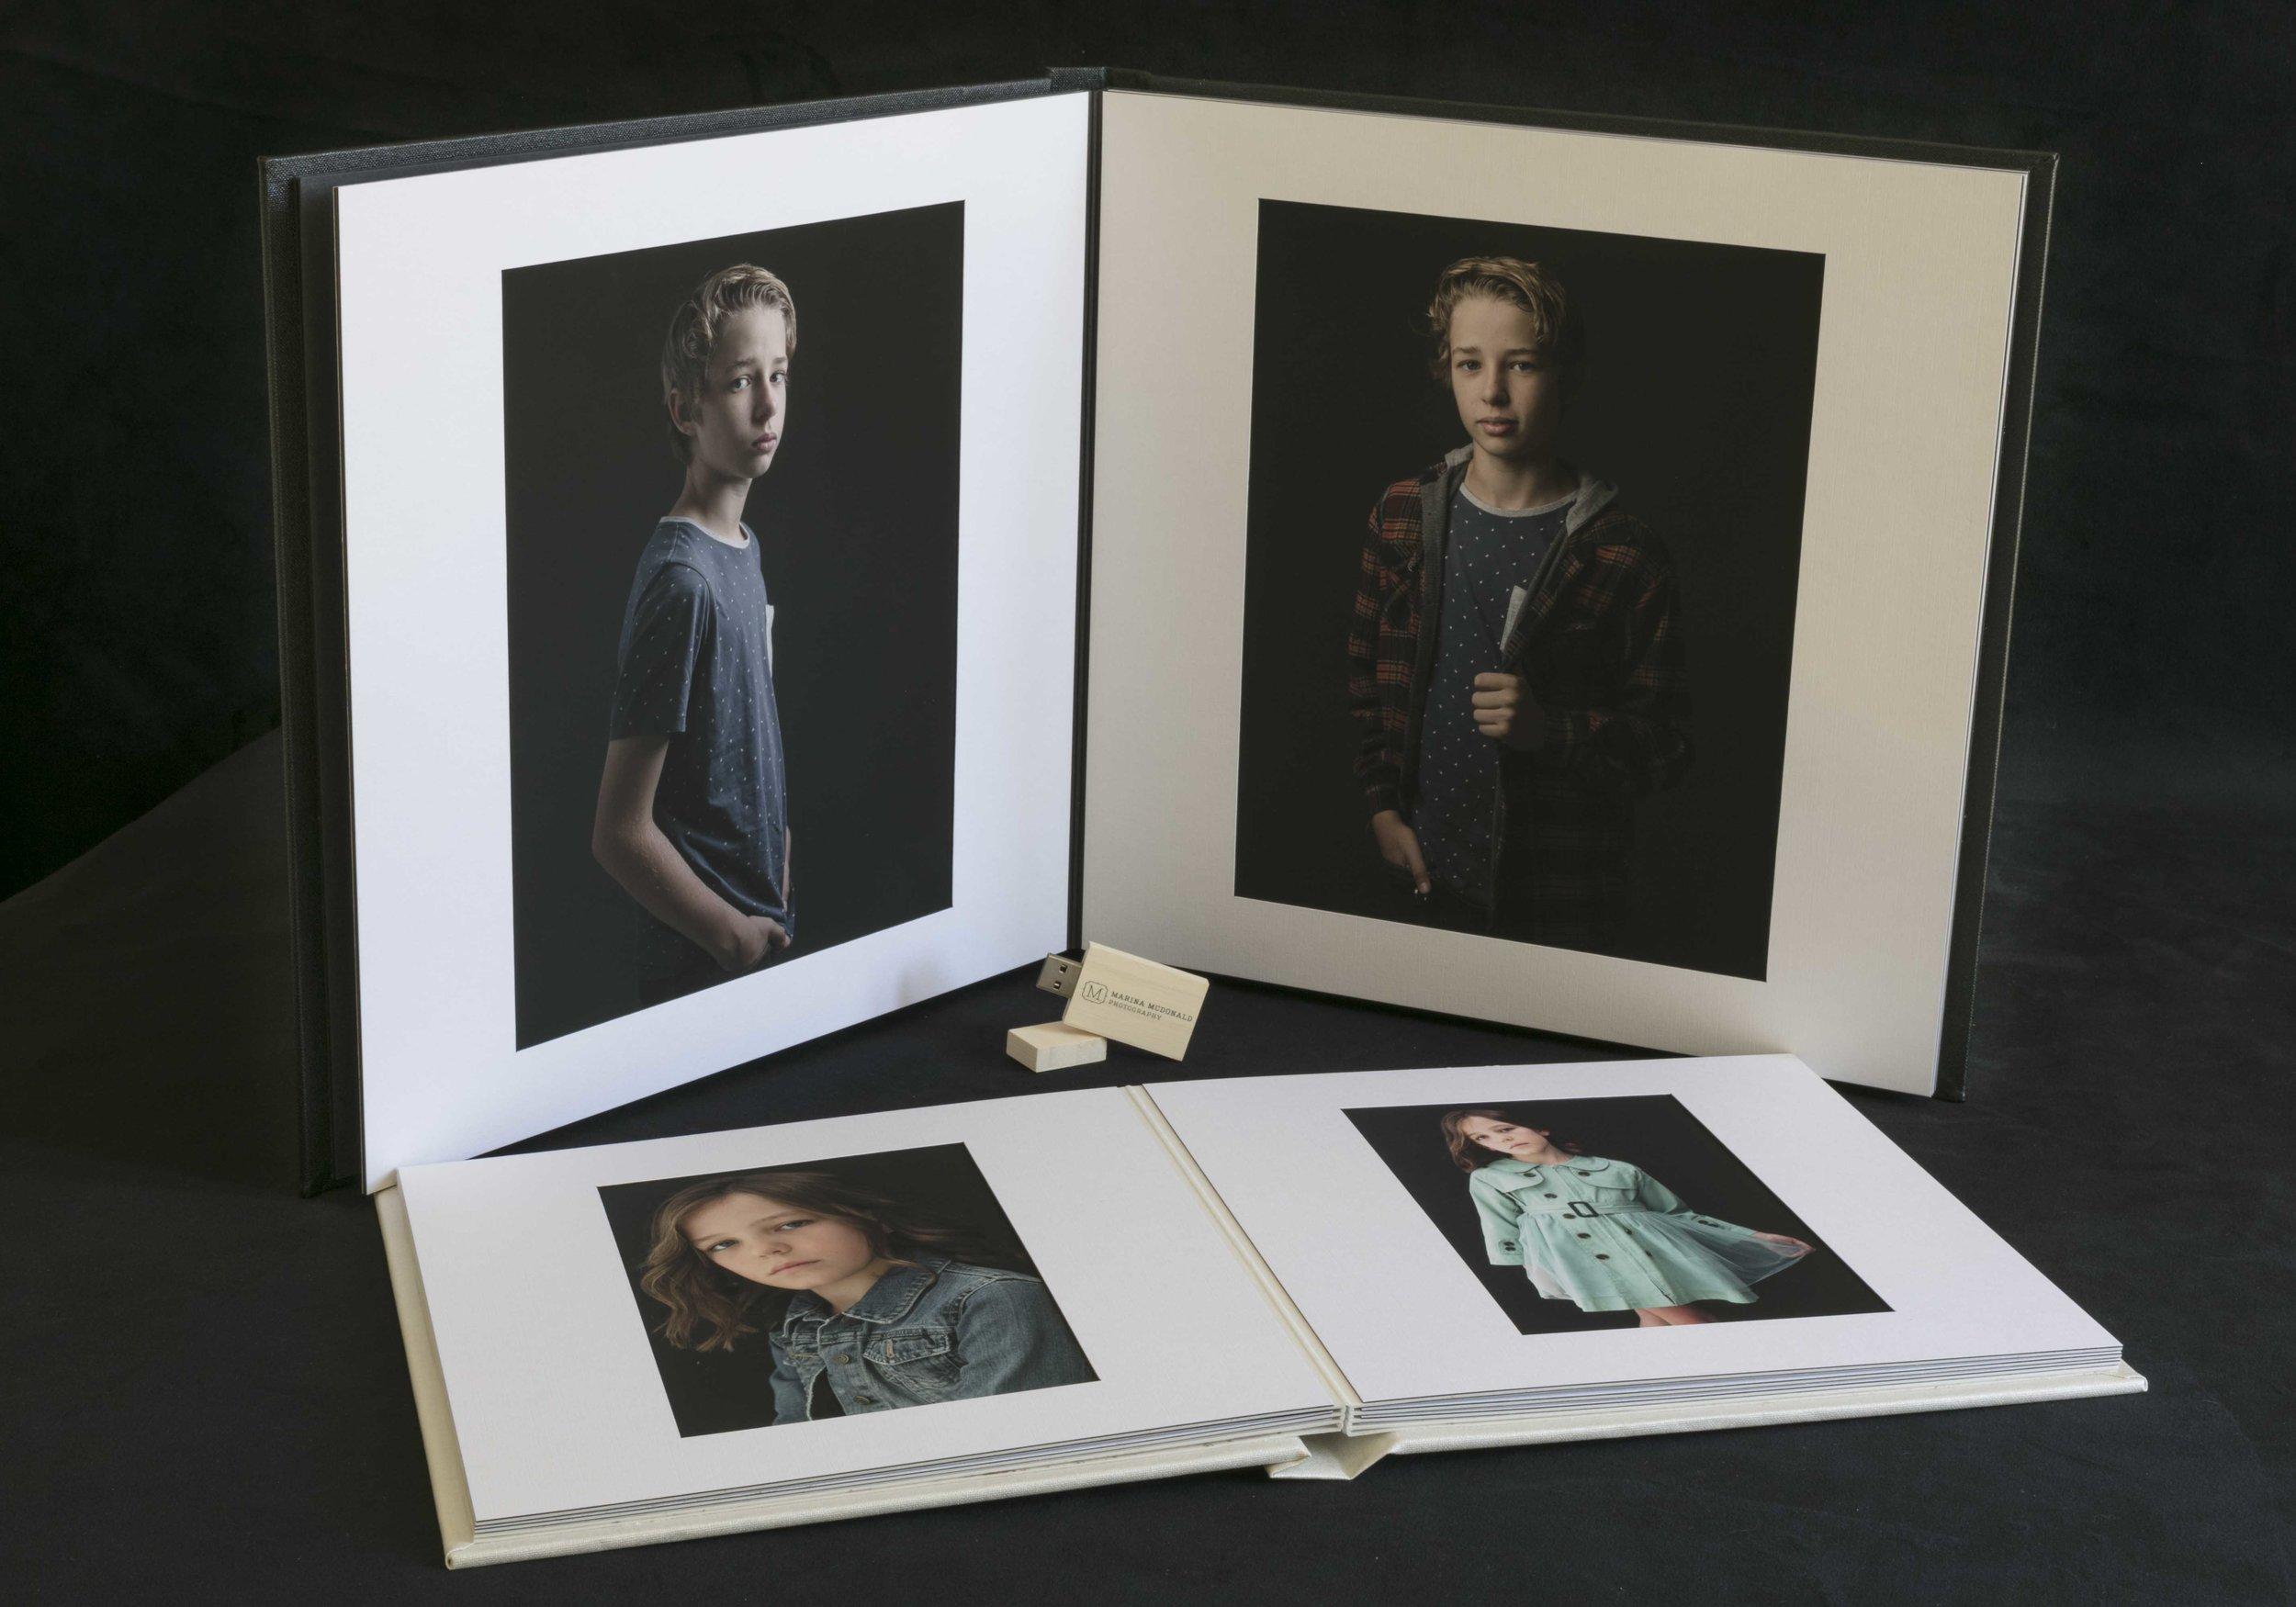 marina-mcdonald-teen-portrait-photography-products-folio-box-album